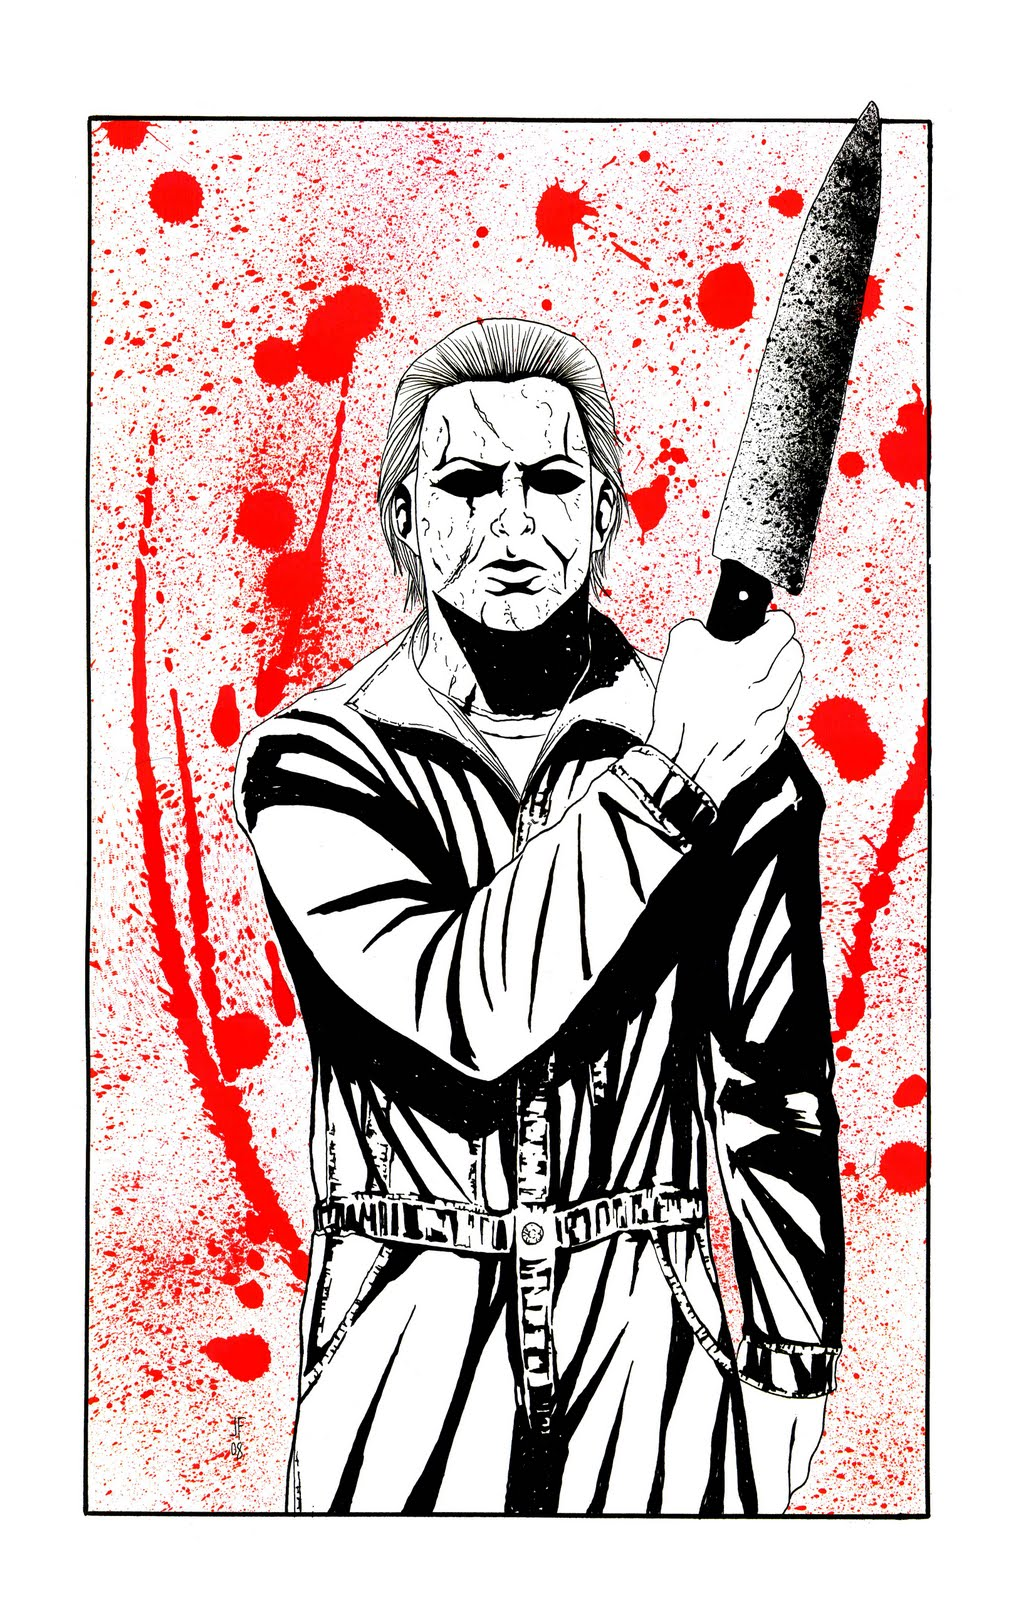 The Art of Jason Flowers: COPYRIGHT INFRINGE THIS!!!